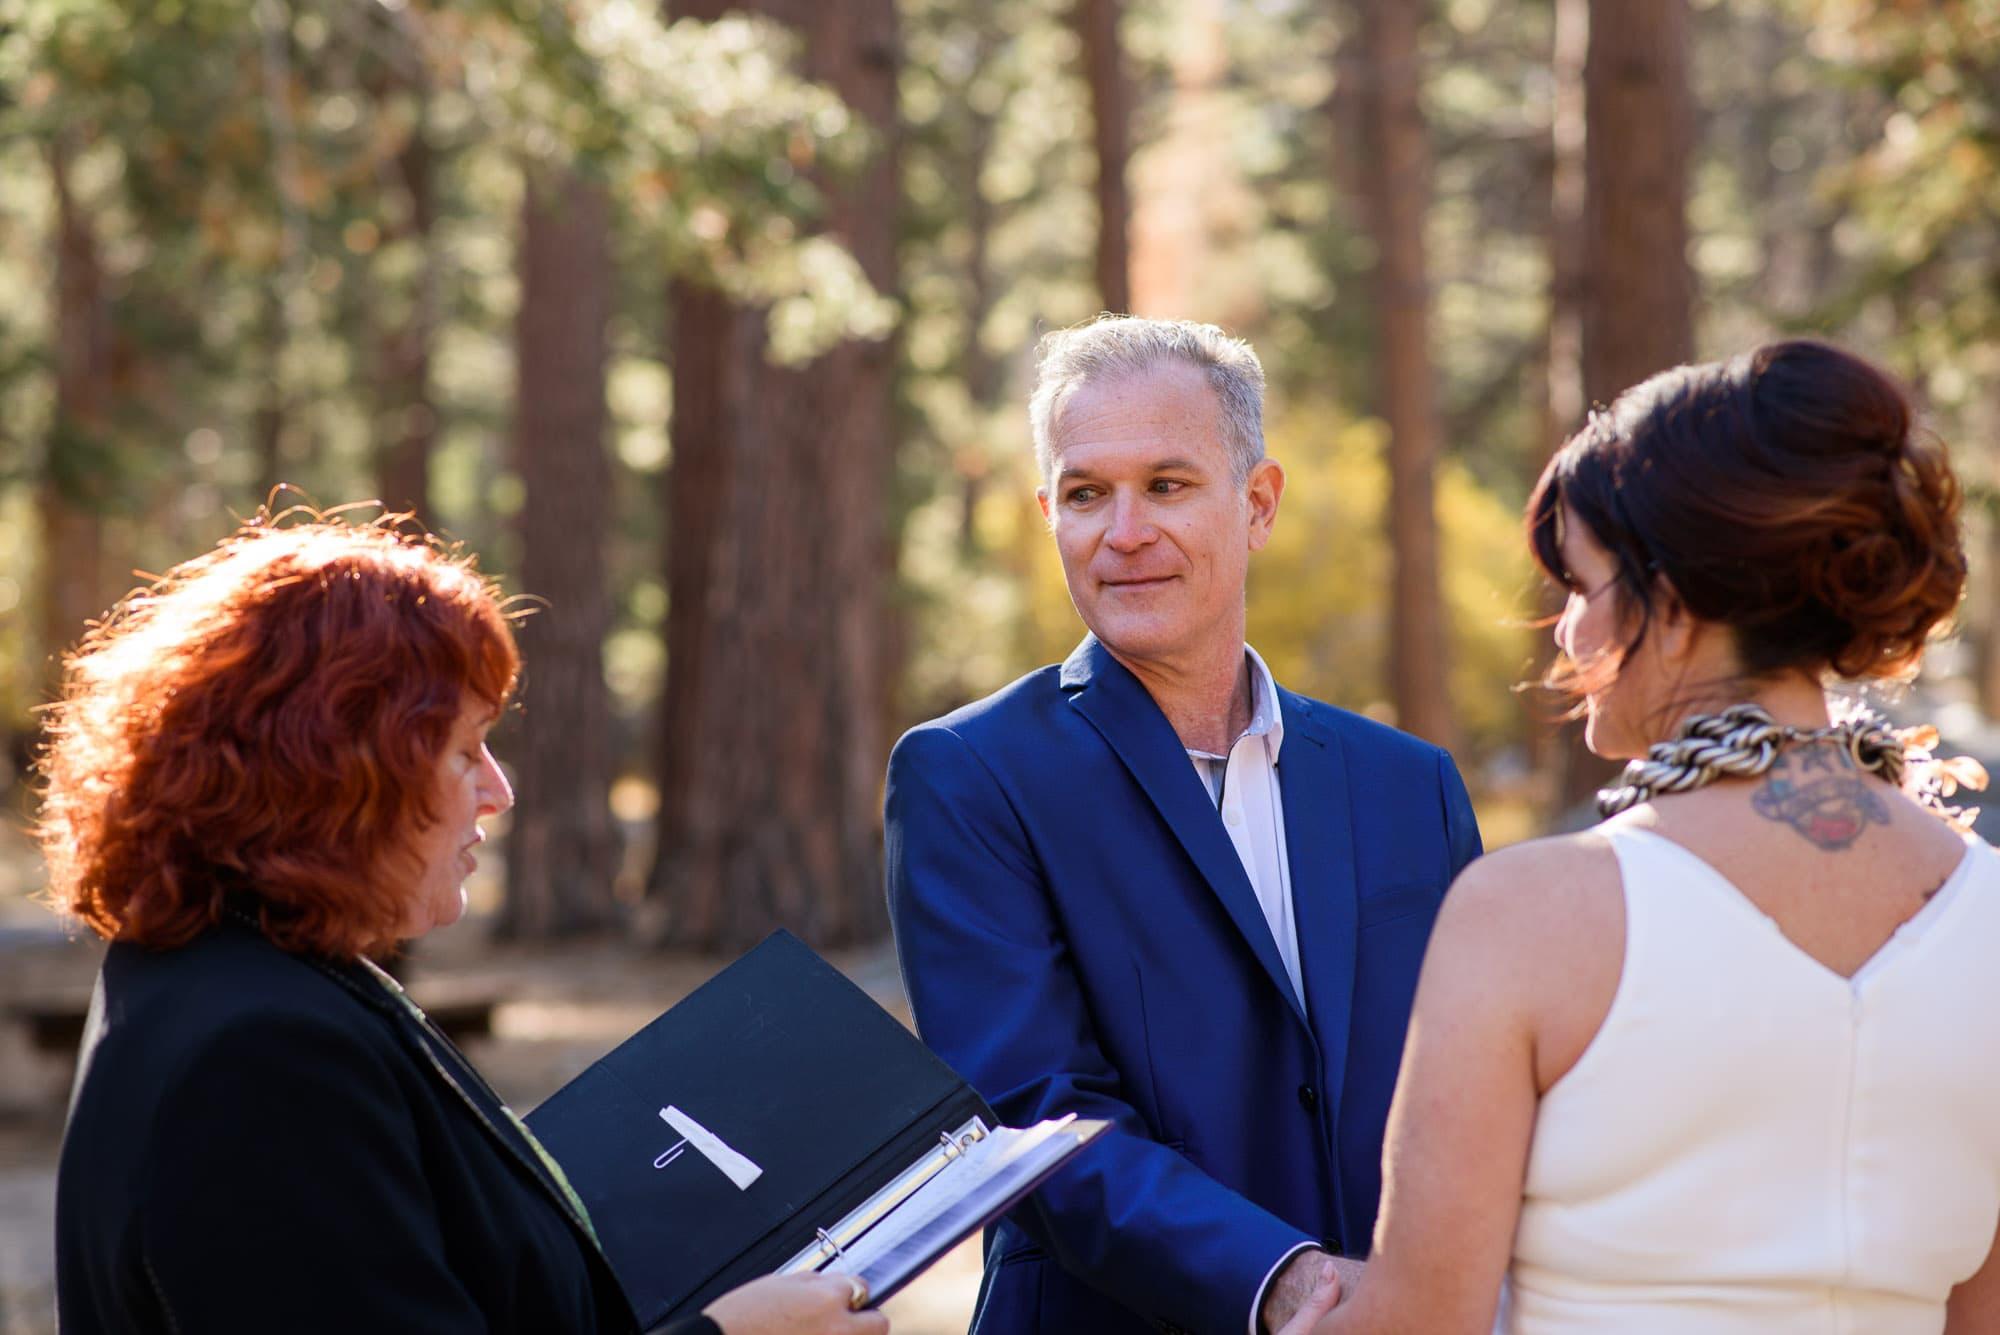 011_Alan_and_Heidi_Palm_Springs_Tram_Wedding